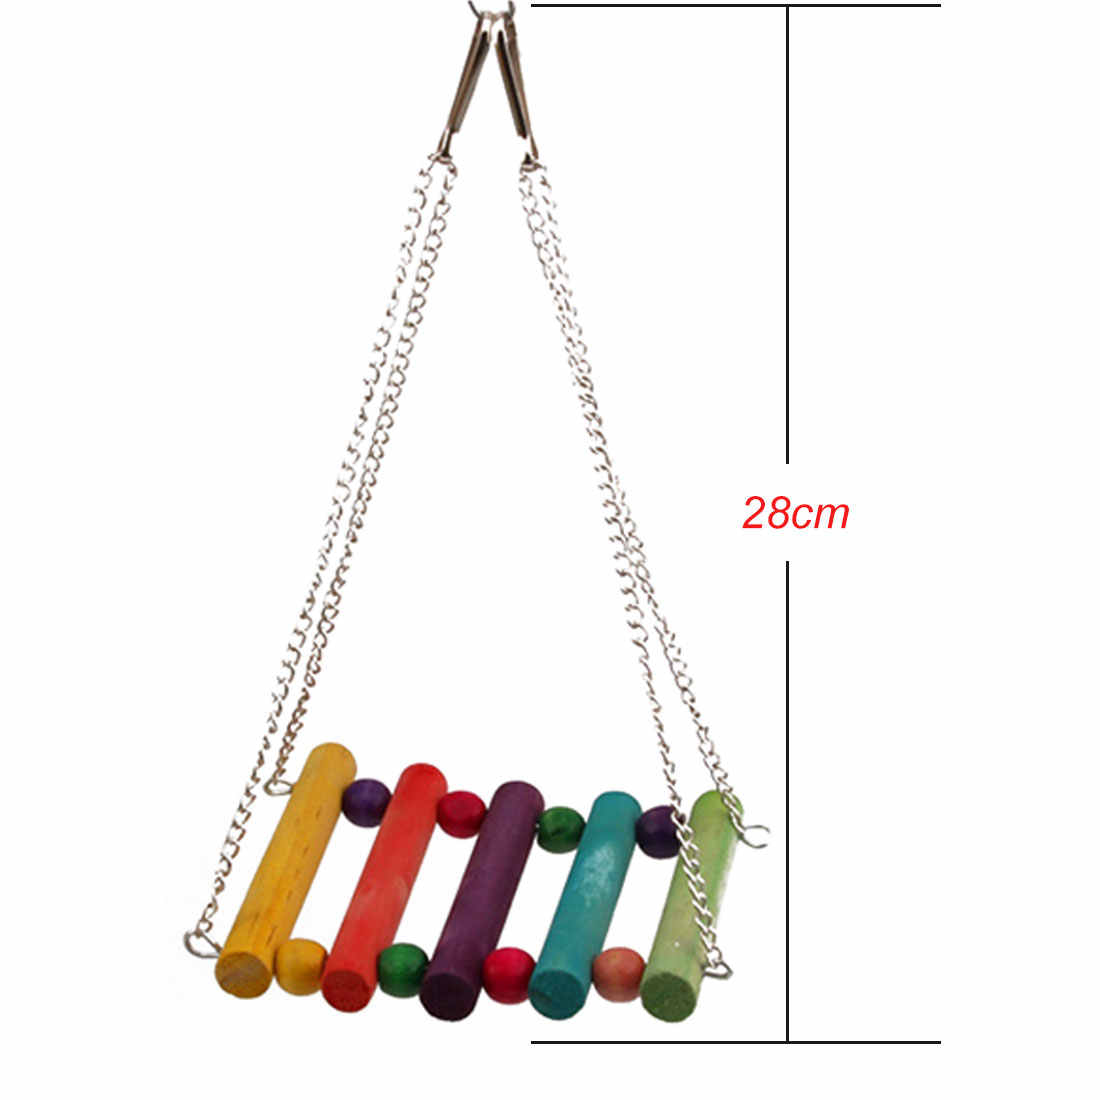 6Pcs/set Bird Parrot Toy Metal Rope Hanging Bell Pet Bird Budgie Cockatiel Cage Hammock Swing Toy Parrot Macaw